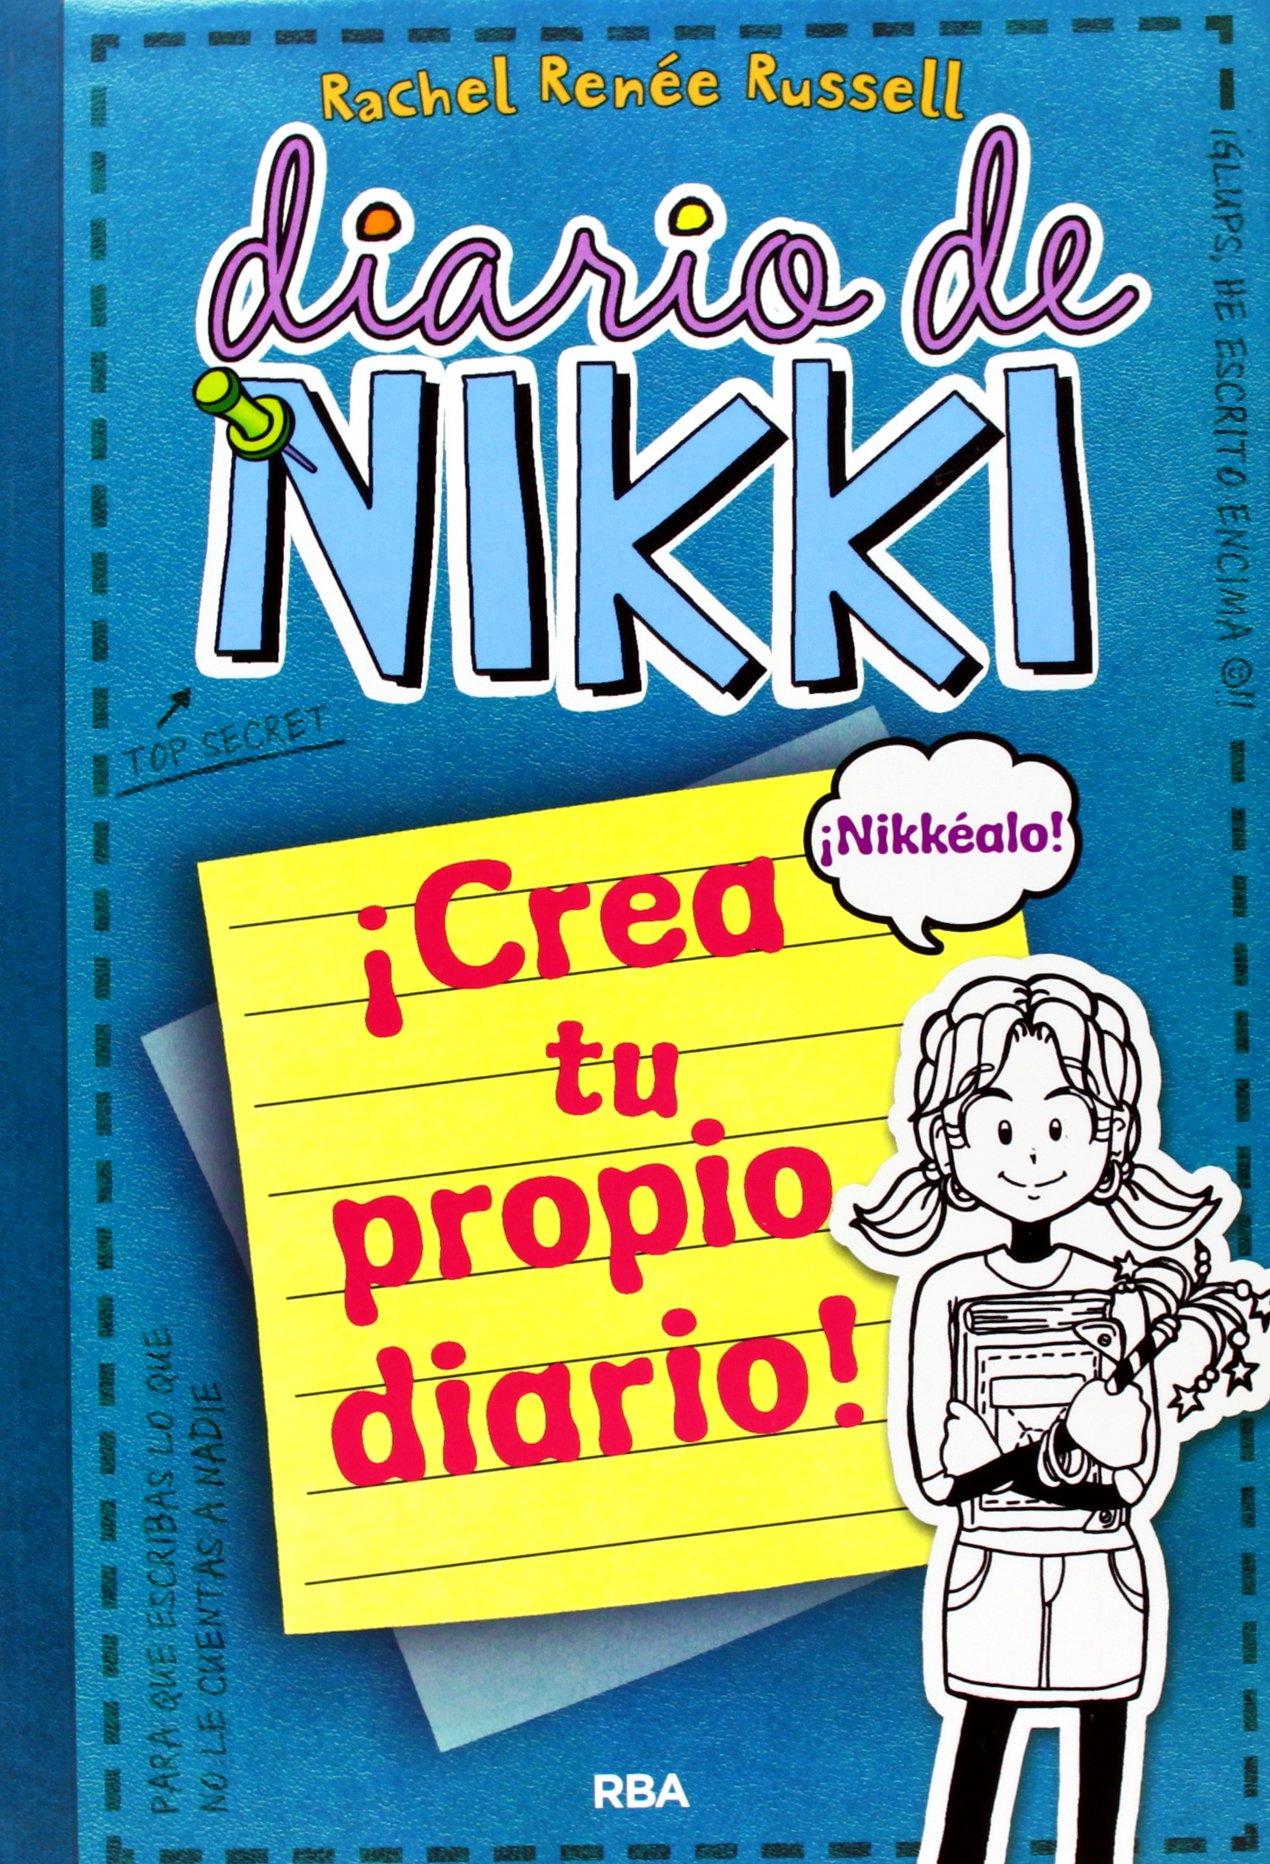 Diario De Nikki Crea Tu Propio Diario Nikkéalo Spanish Edition Russell Rachel Rénee Llasat Botija Isabel 9788427203709 Books